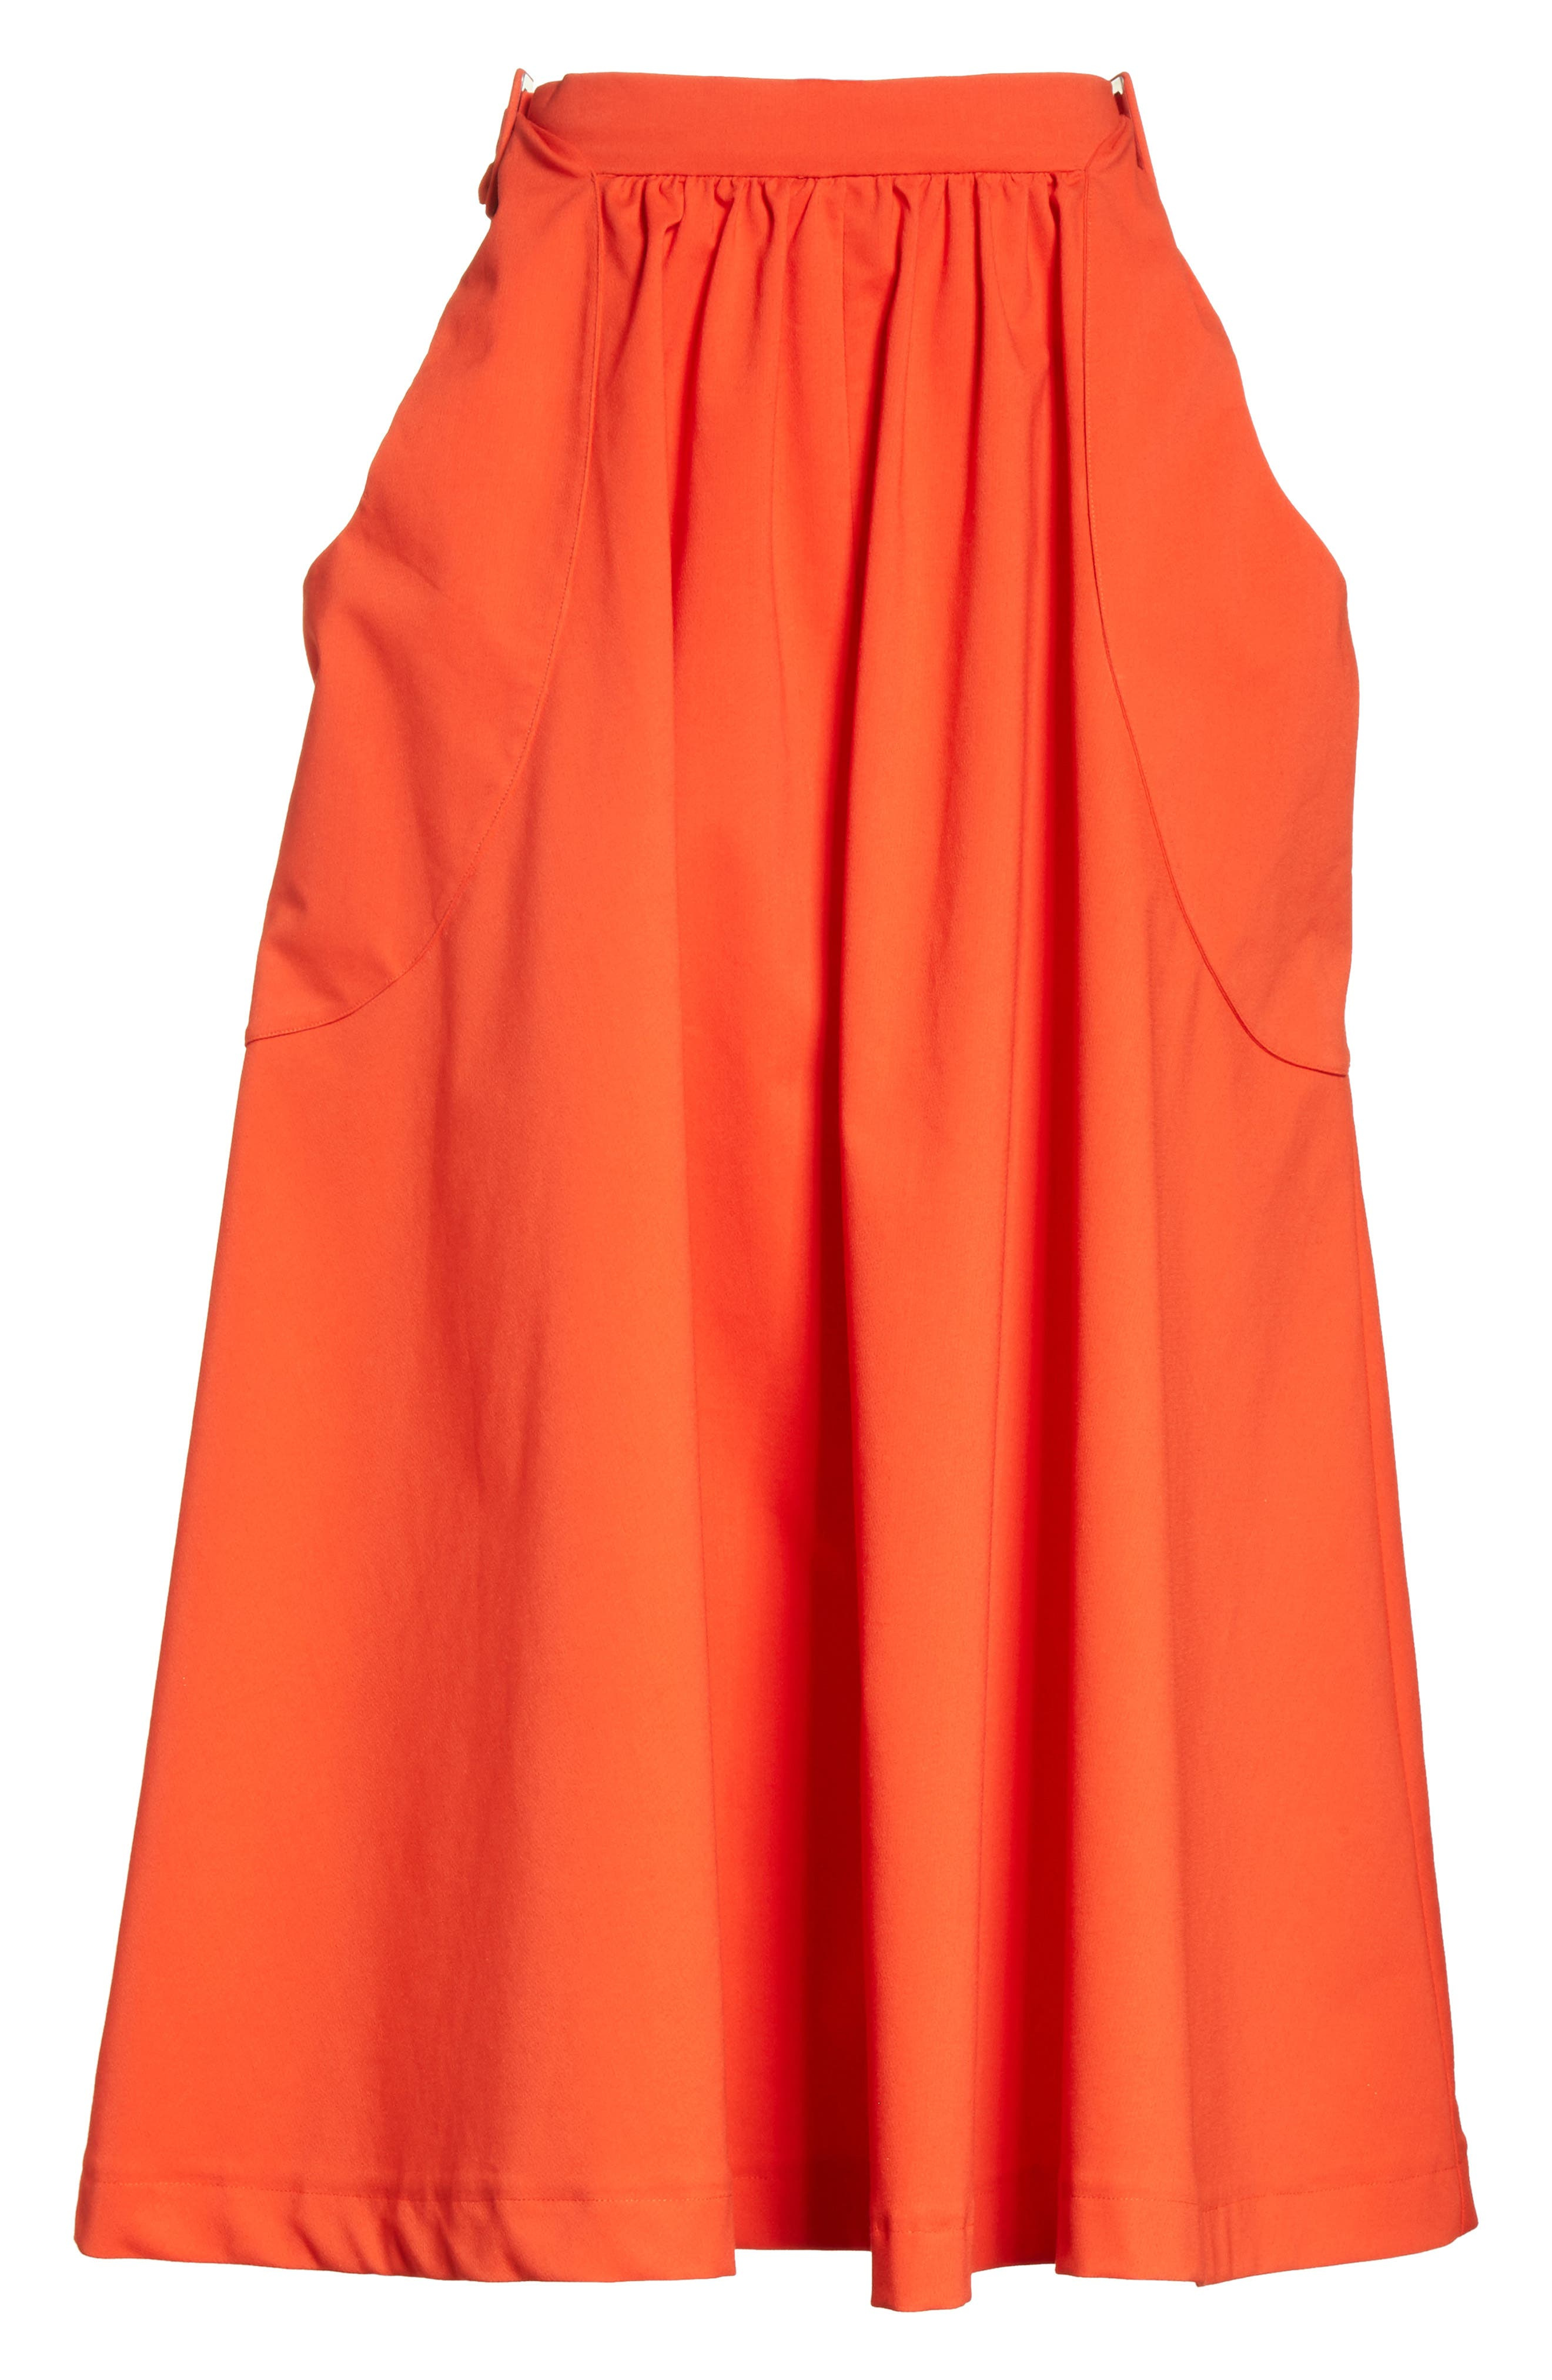 Belted Pocket Skirt,                             Alternate thumbnail 6, color,                             610